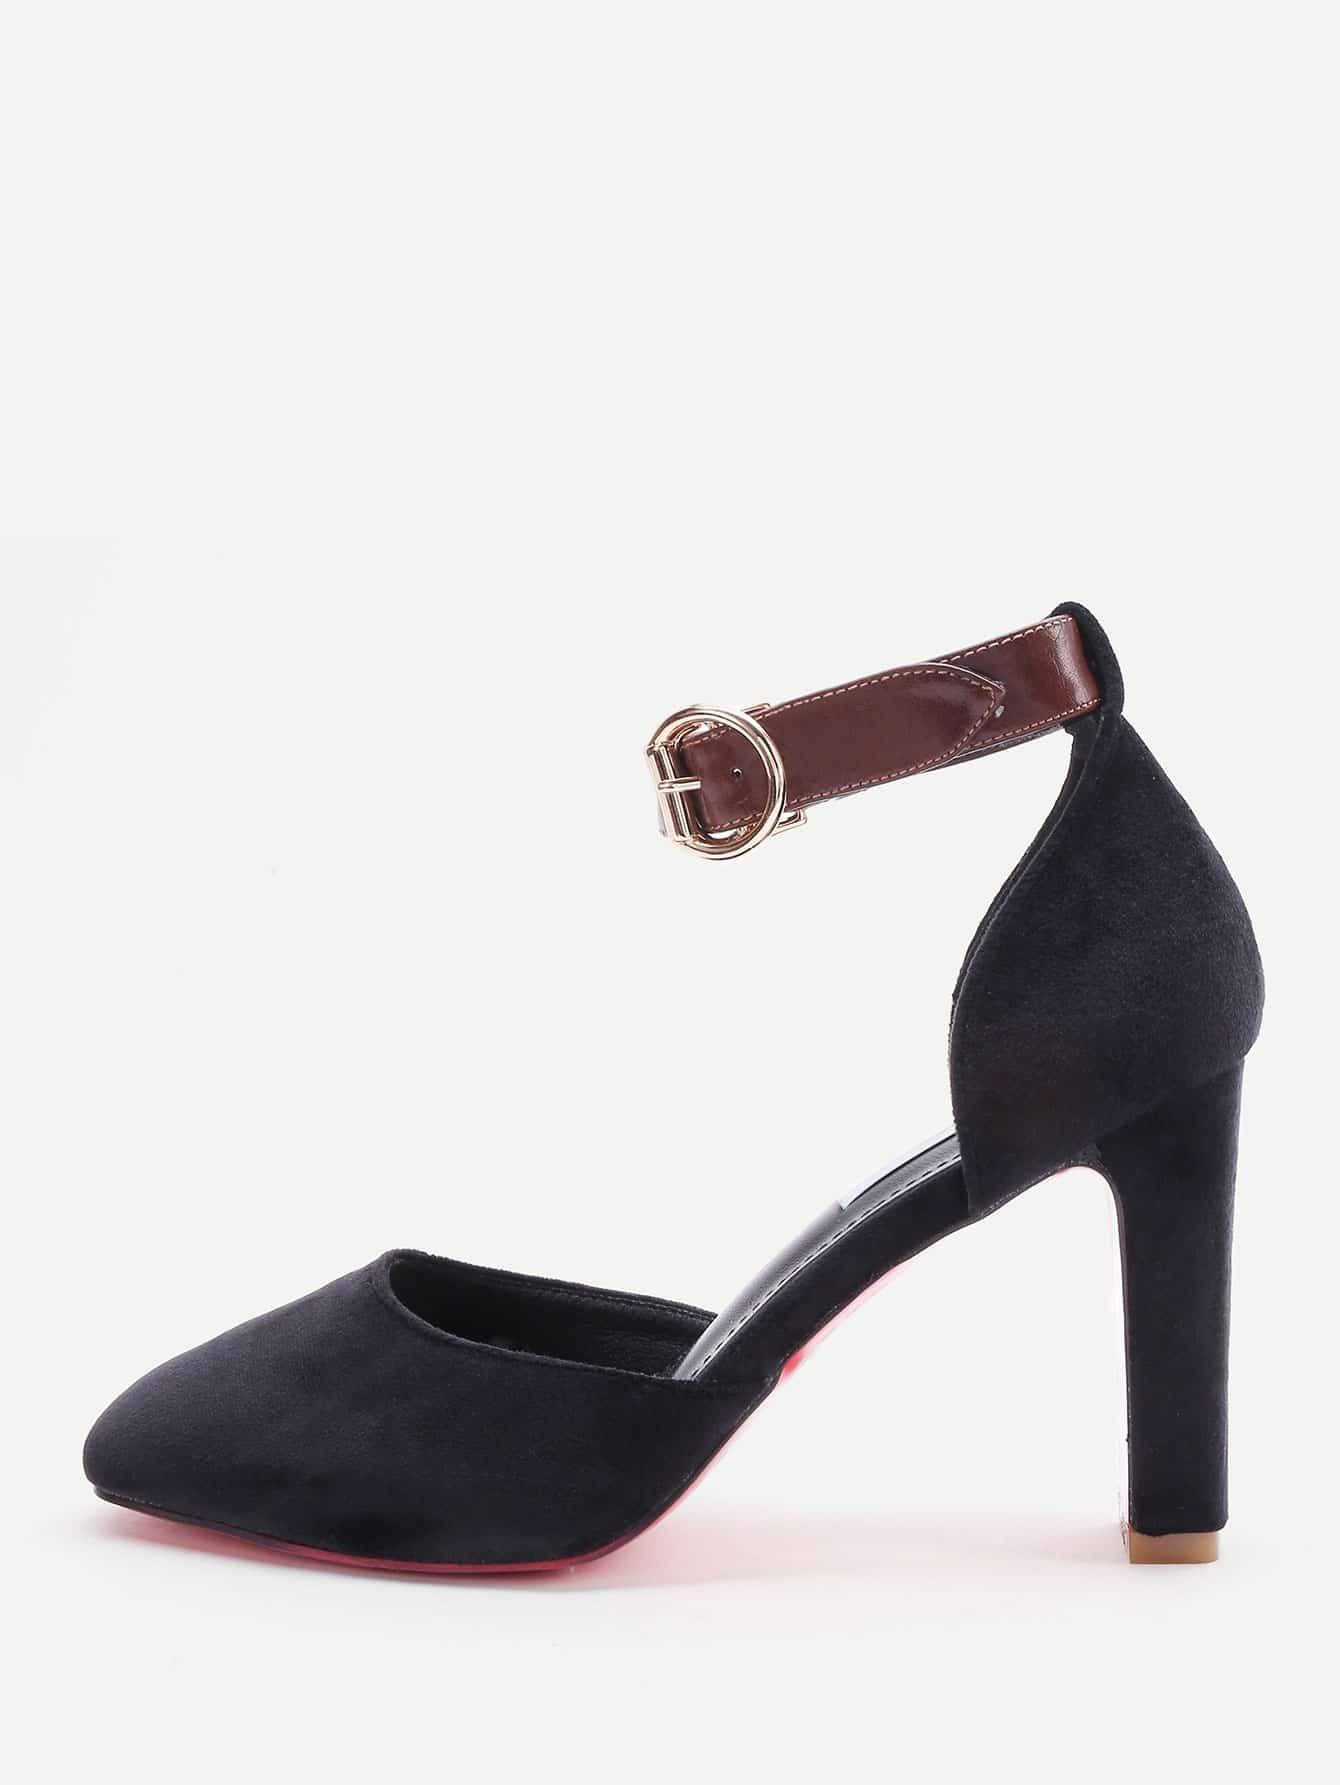 Фото Black Ankle Strap Stiletto Heels. Купить с доставкой